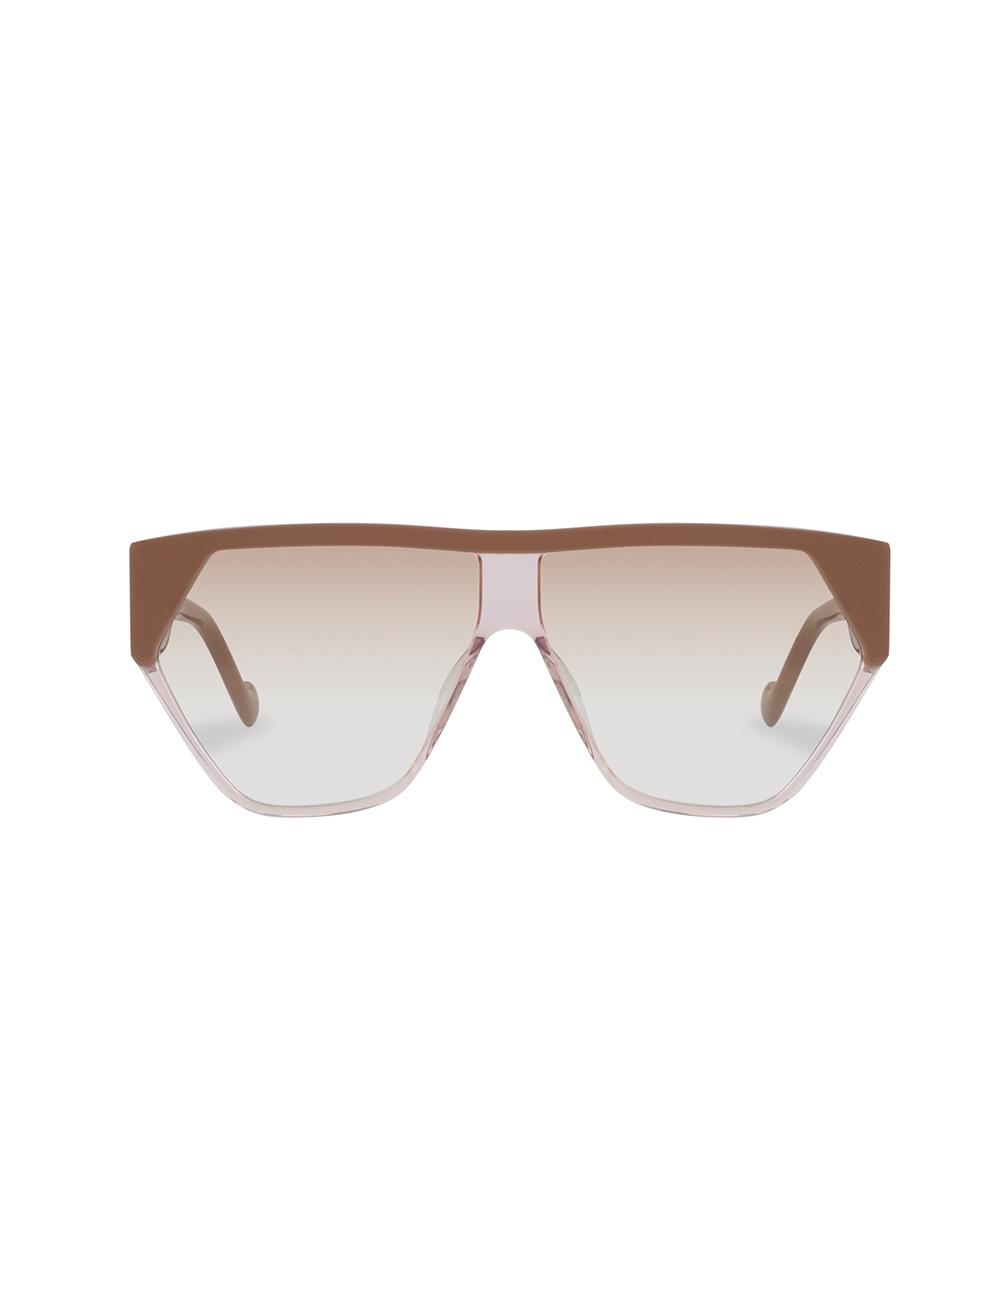 Resistance Shield Sunglasses